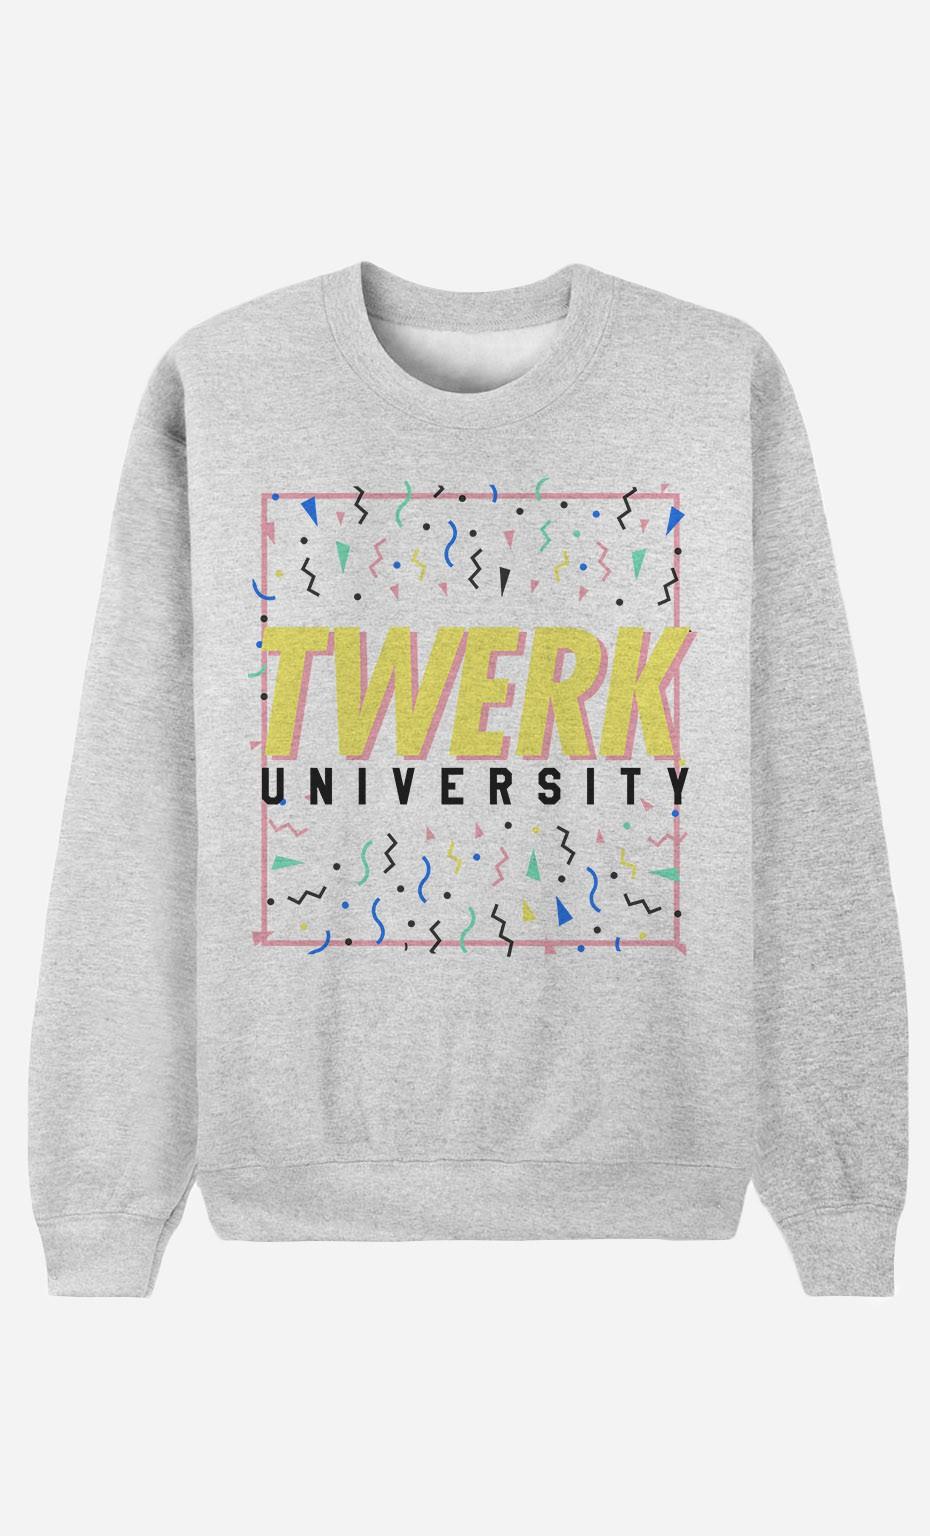 Sweat Femme Twerk University